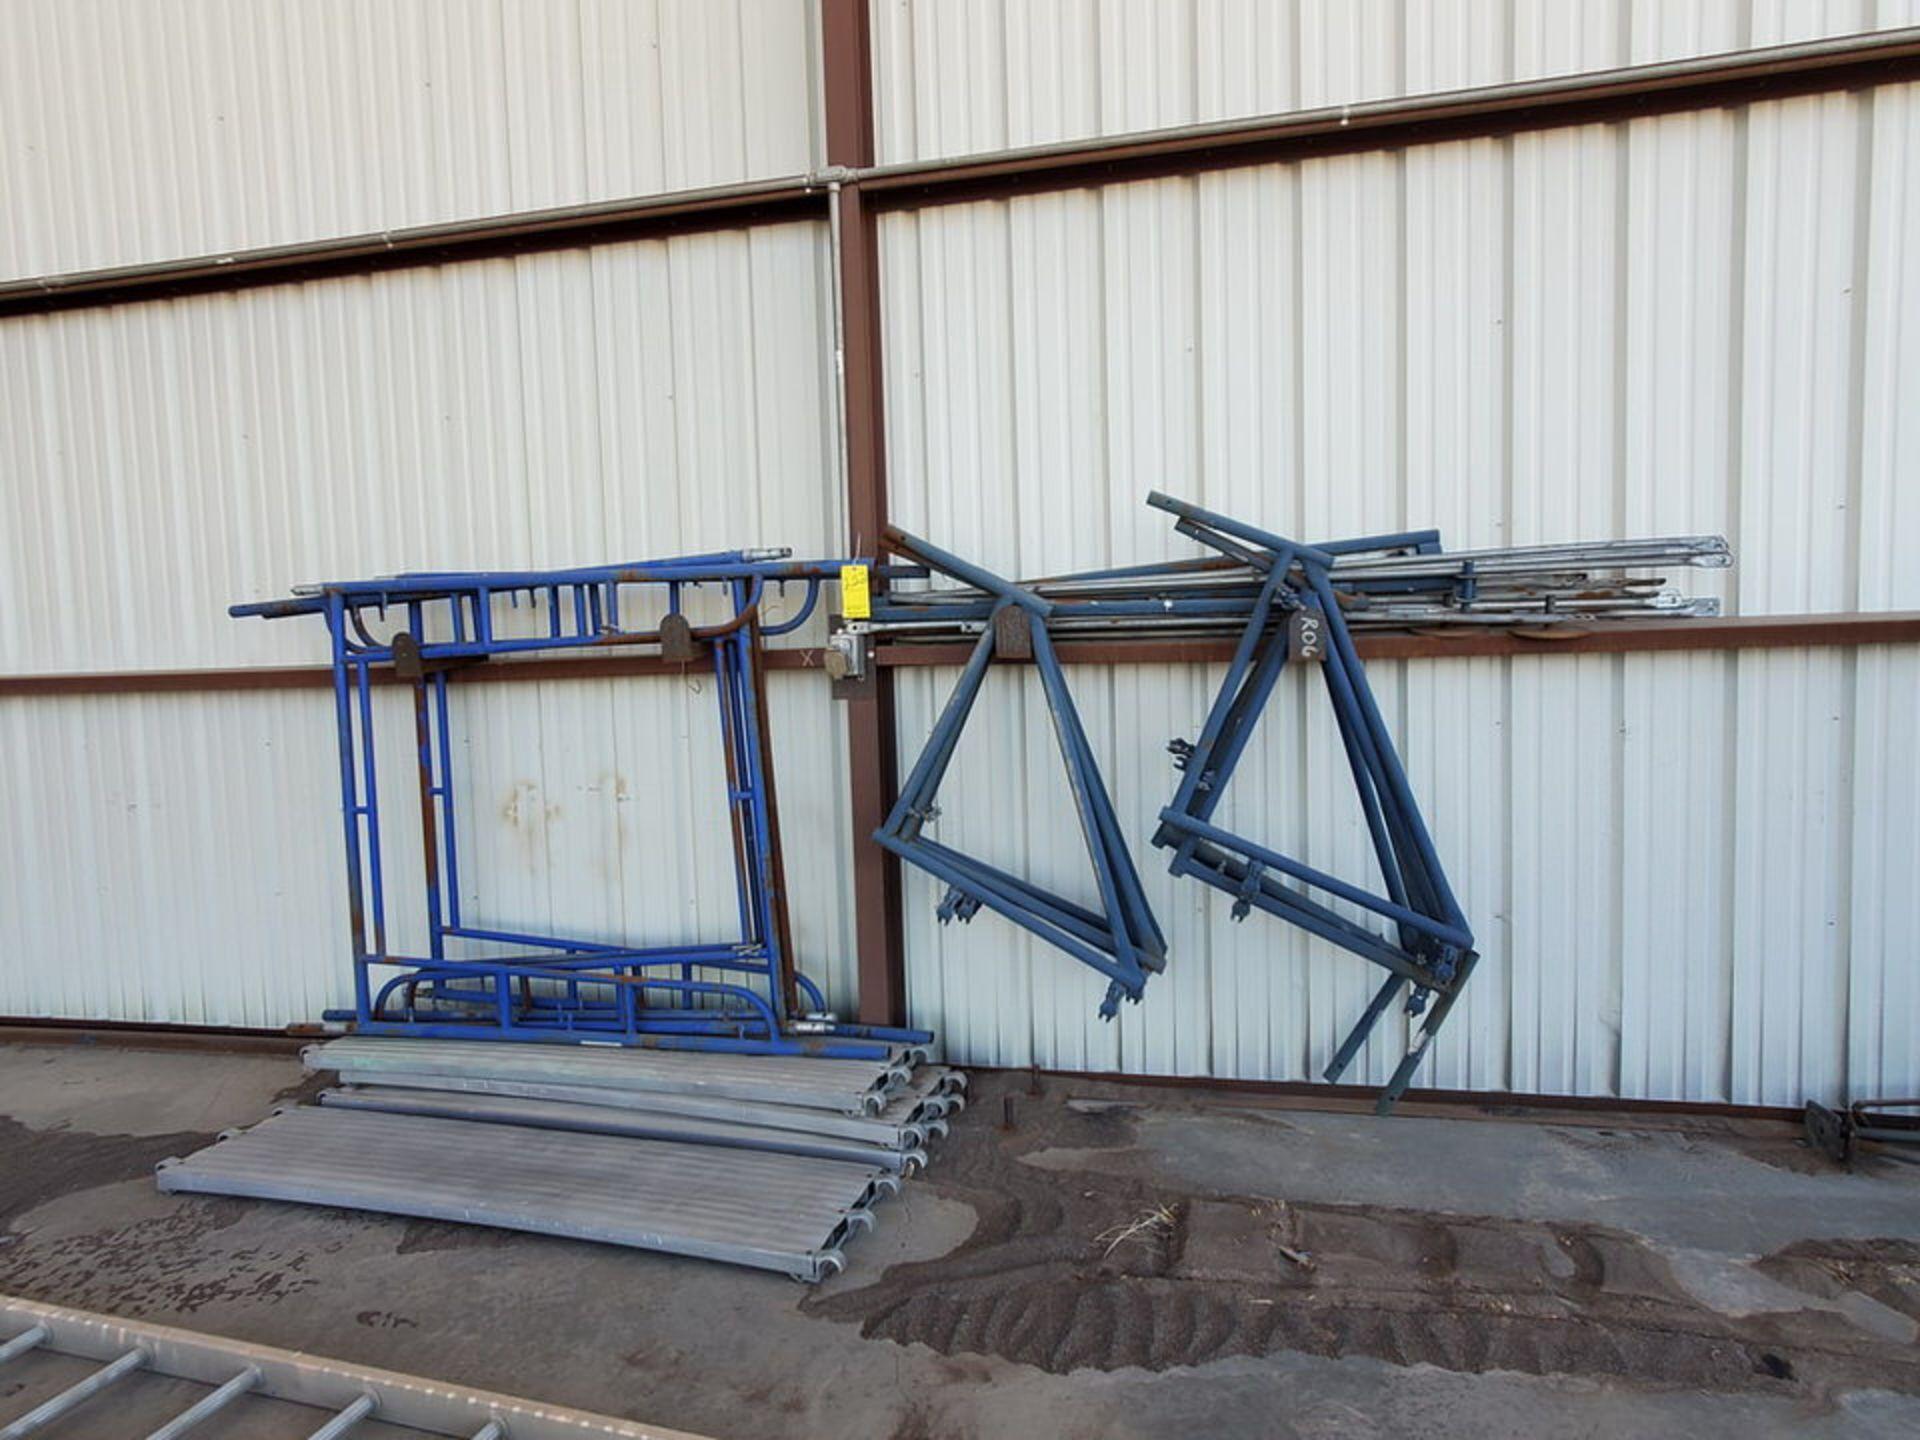 Scaffold W' 16' Fixed Alum. Ladder - Image 2 of 10